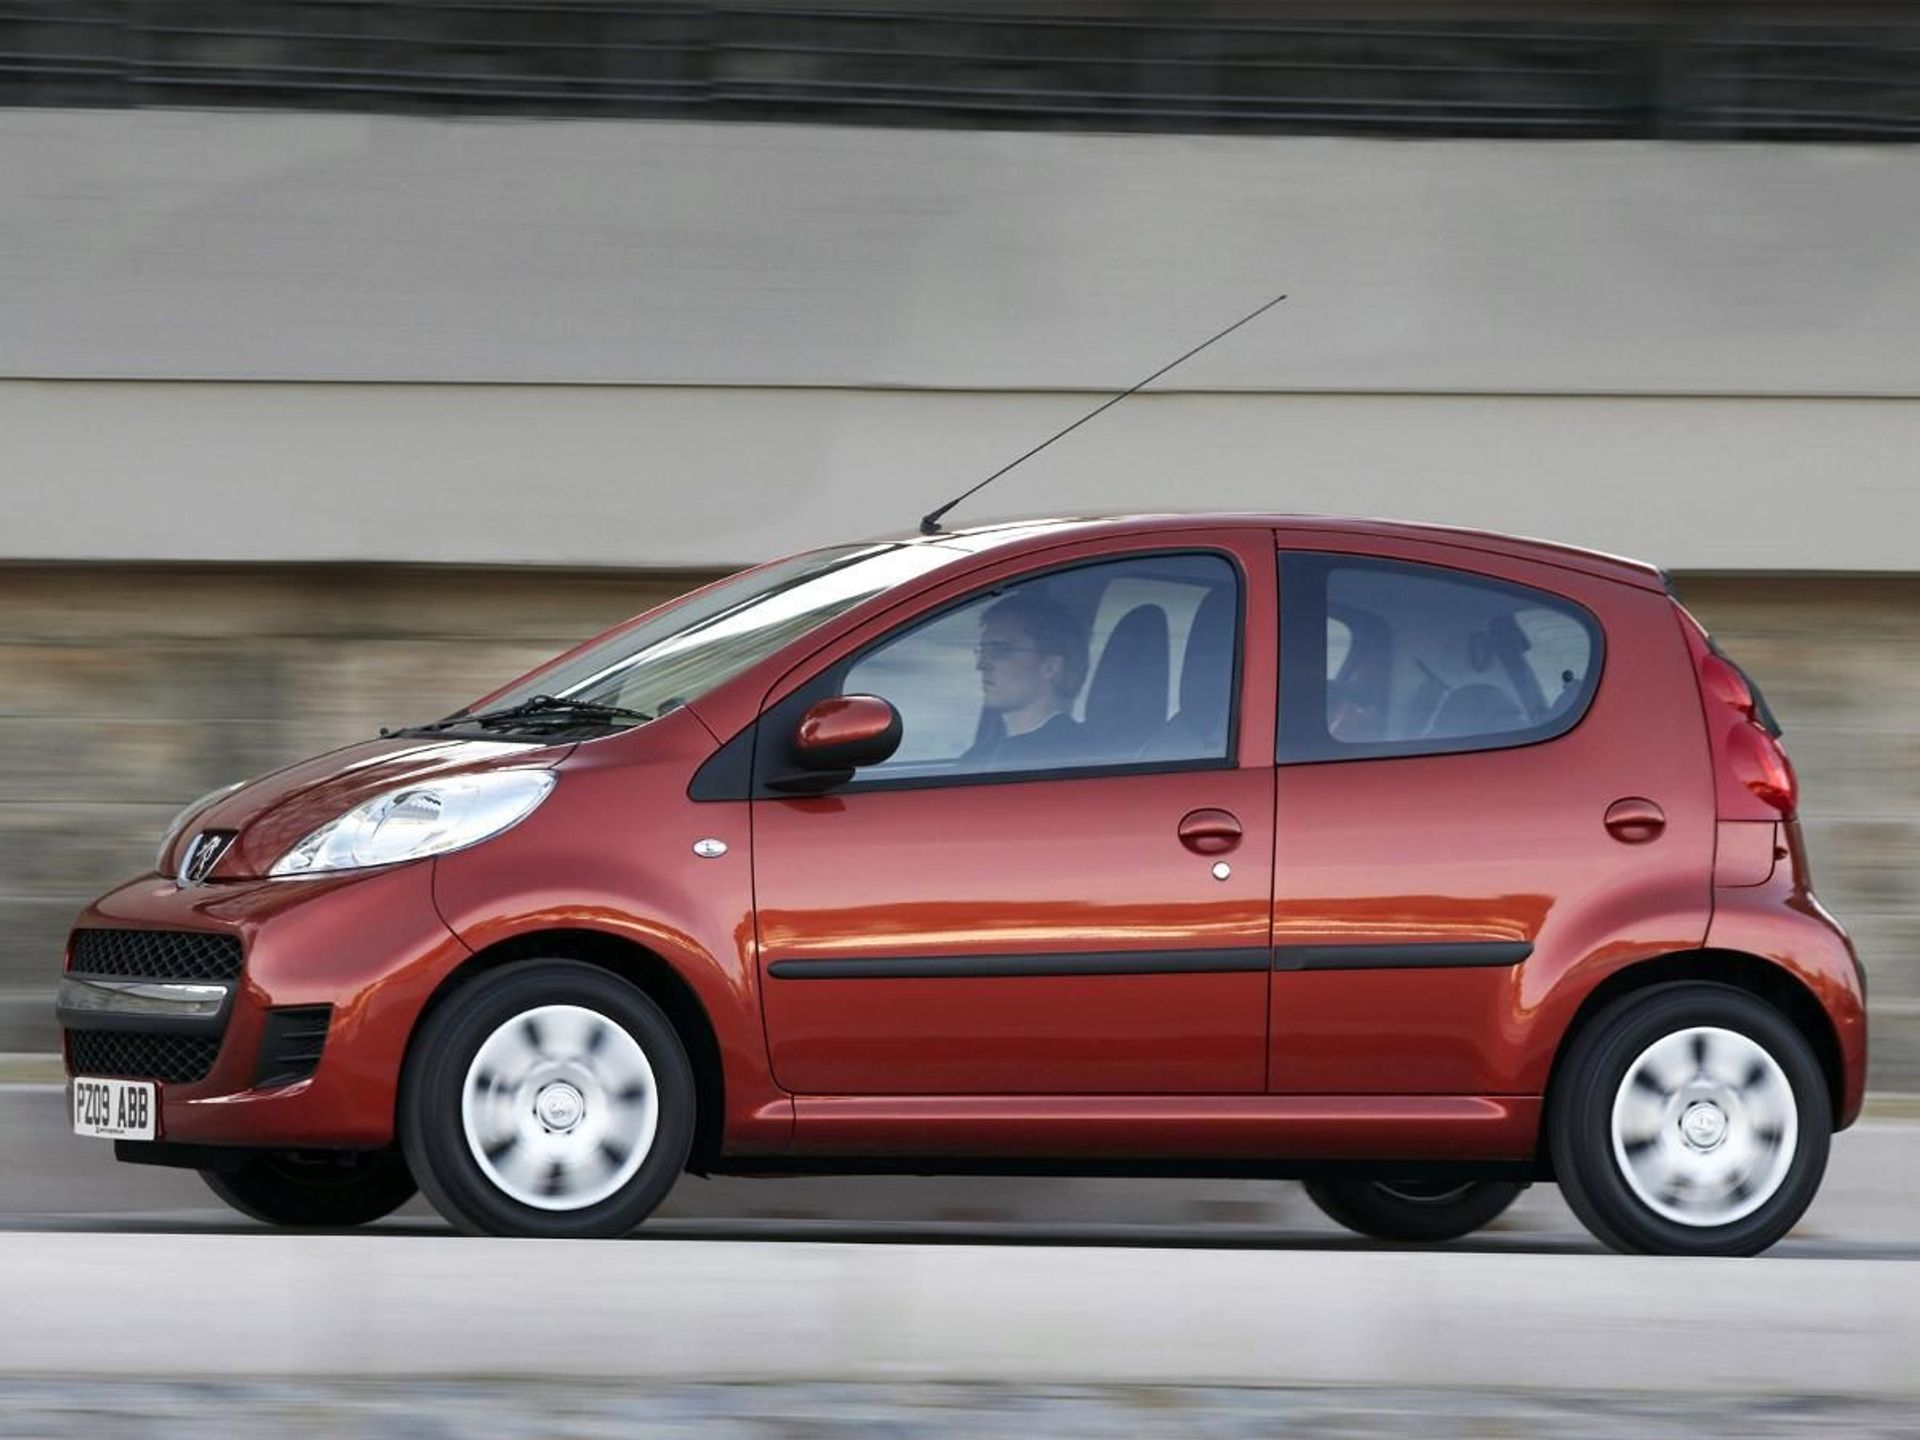 Peugeot 107  image